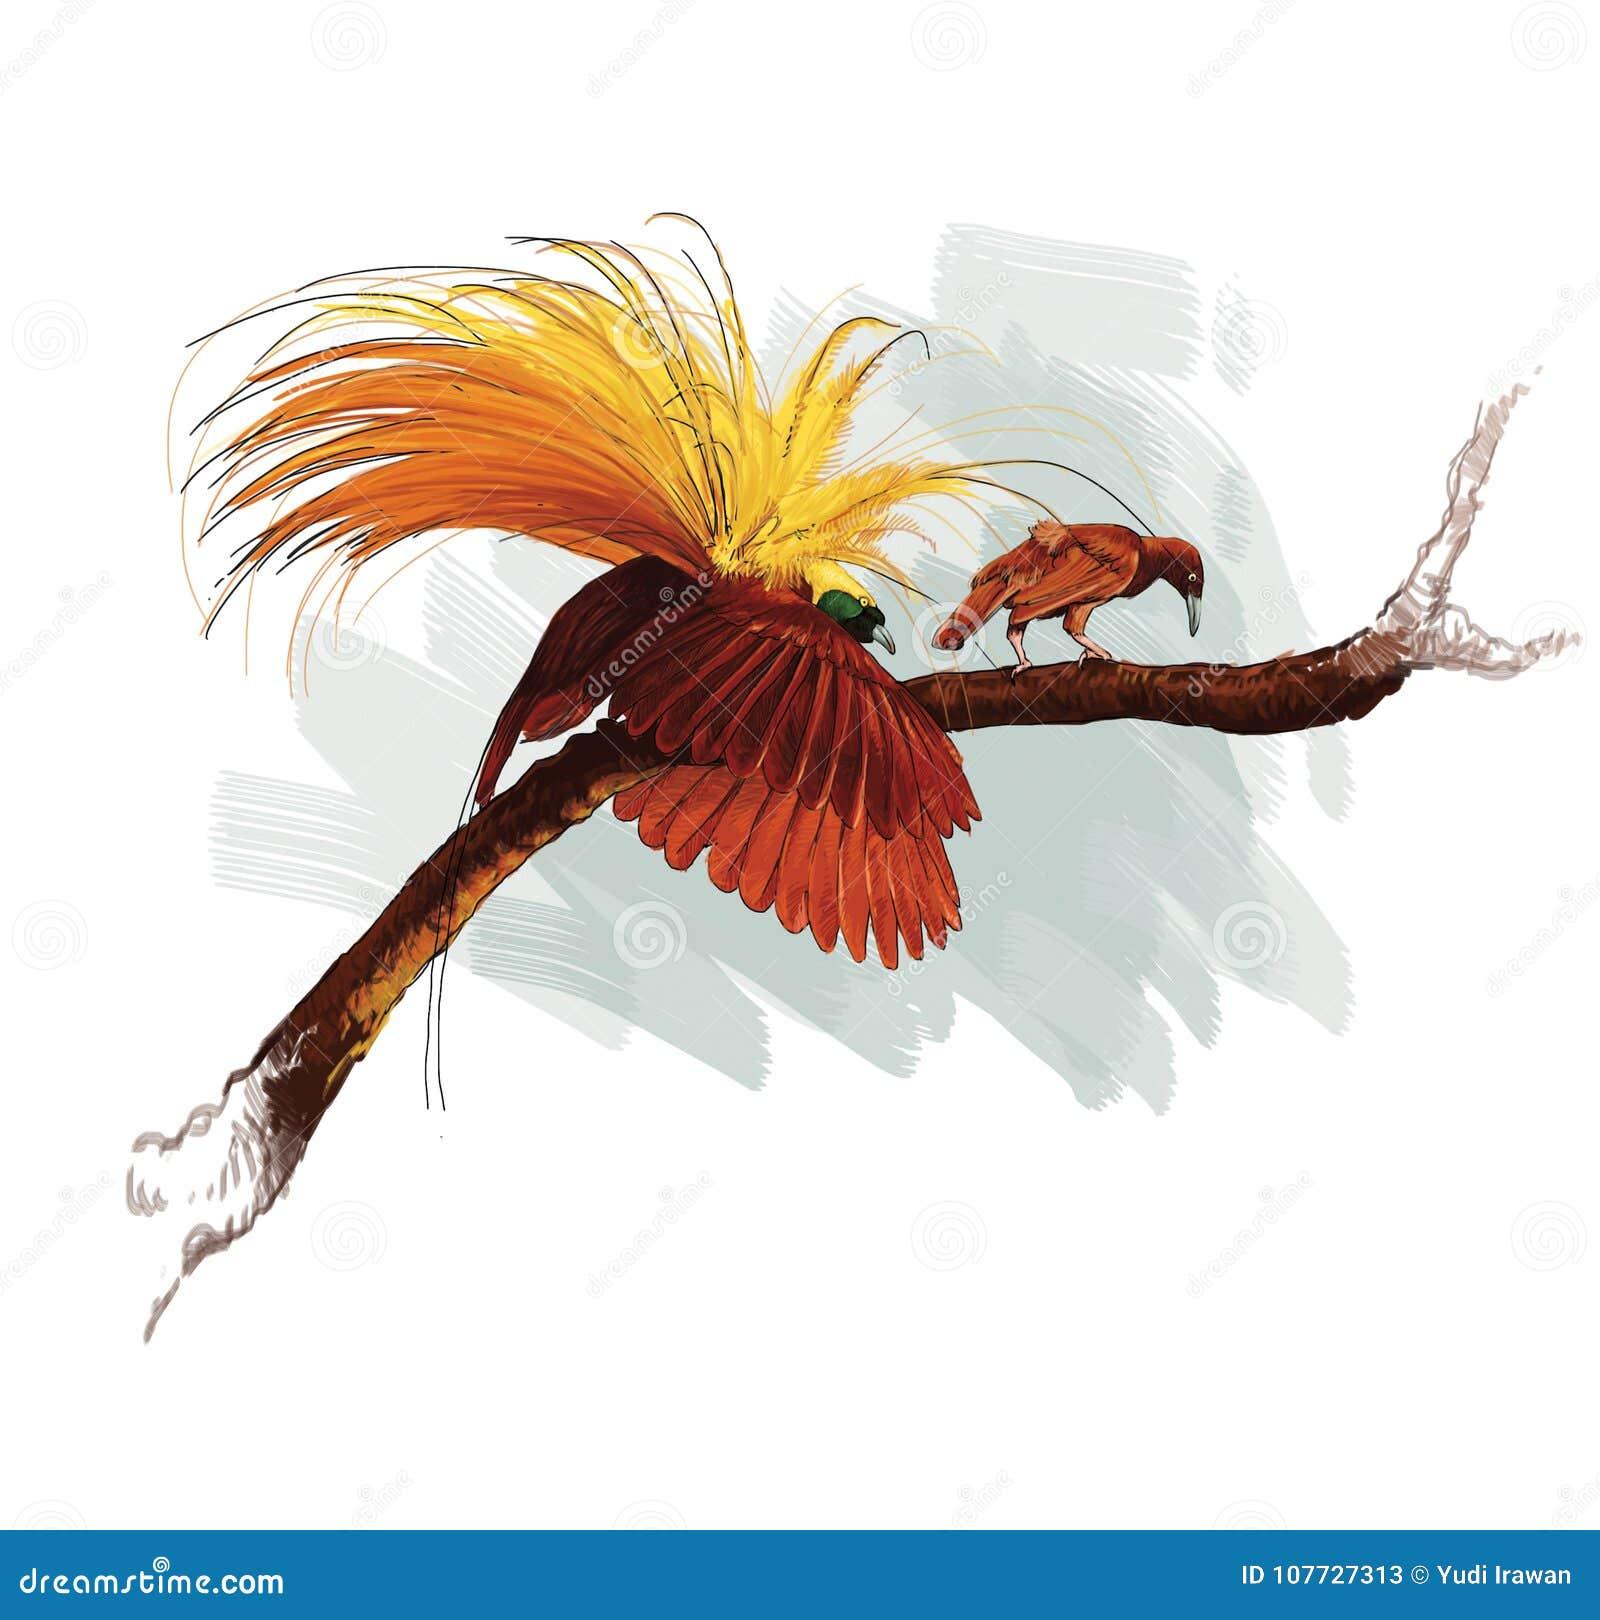 Cendrawasih Bird Papua Indonesia Stock Illustration Illustration Of Drawing Softness 107727313